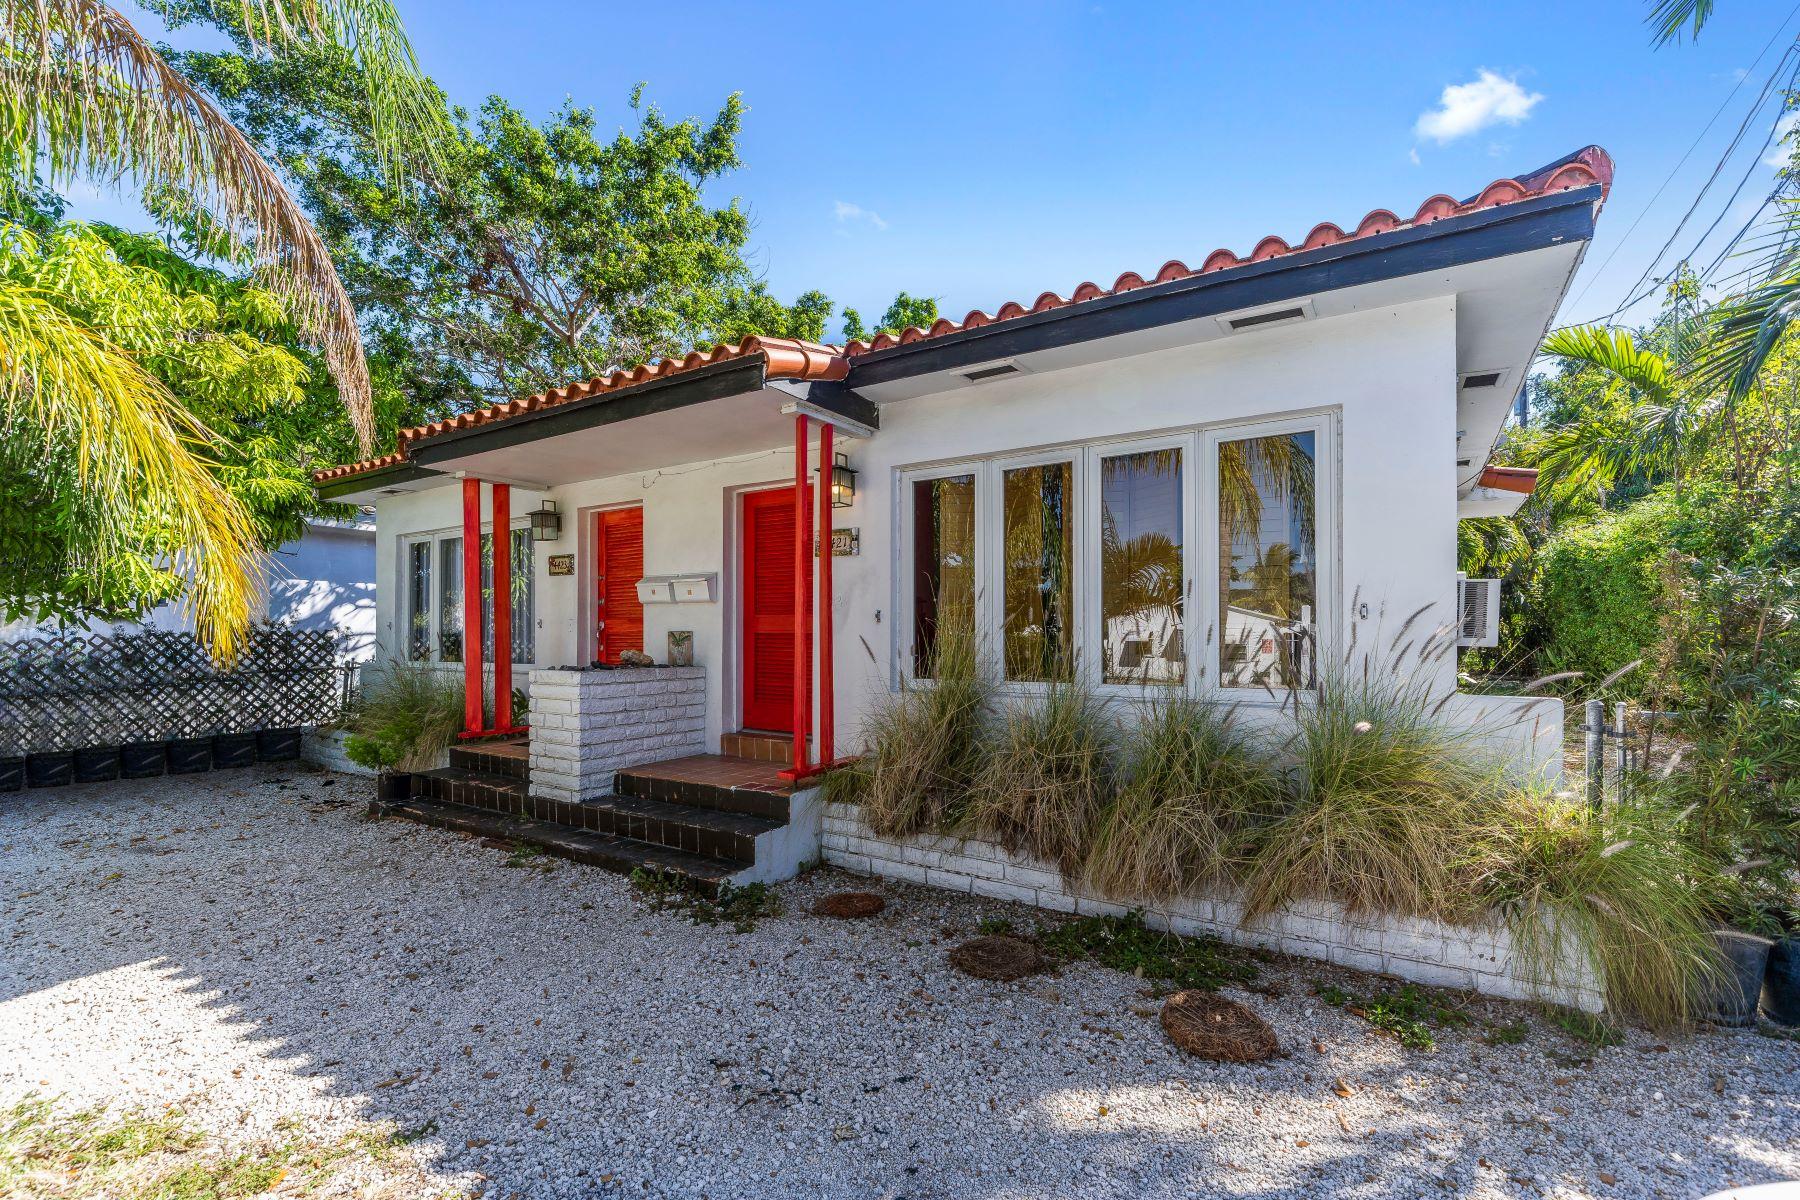 Duplex for Sale at 4421 N Miami Ave 4421 N Miami Ave Miami, Florida 33127 United States